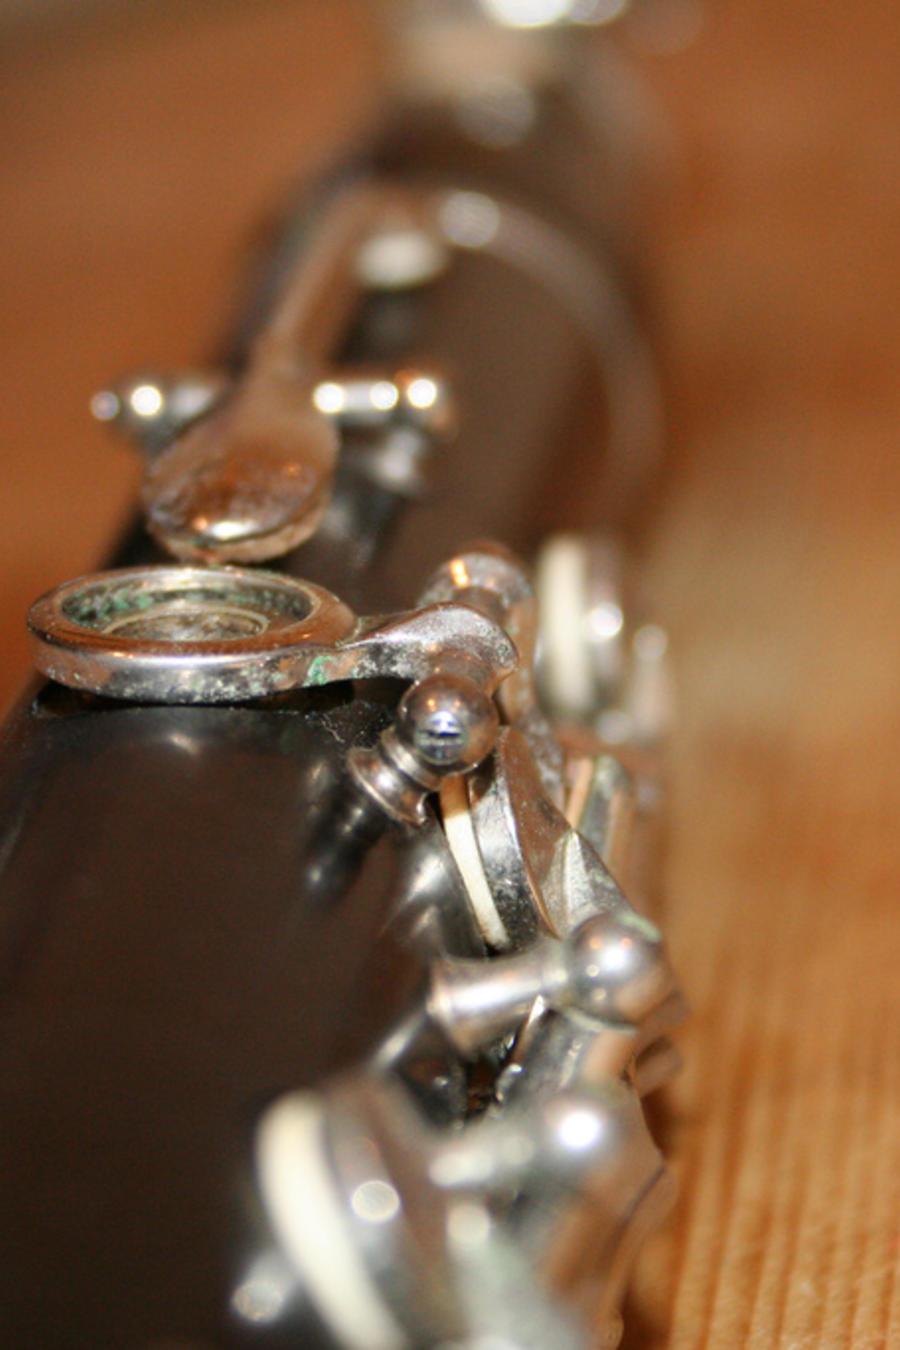 Clarinete/Flickr ndrwfgg